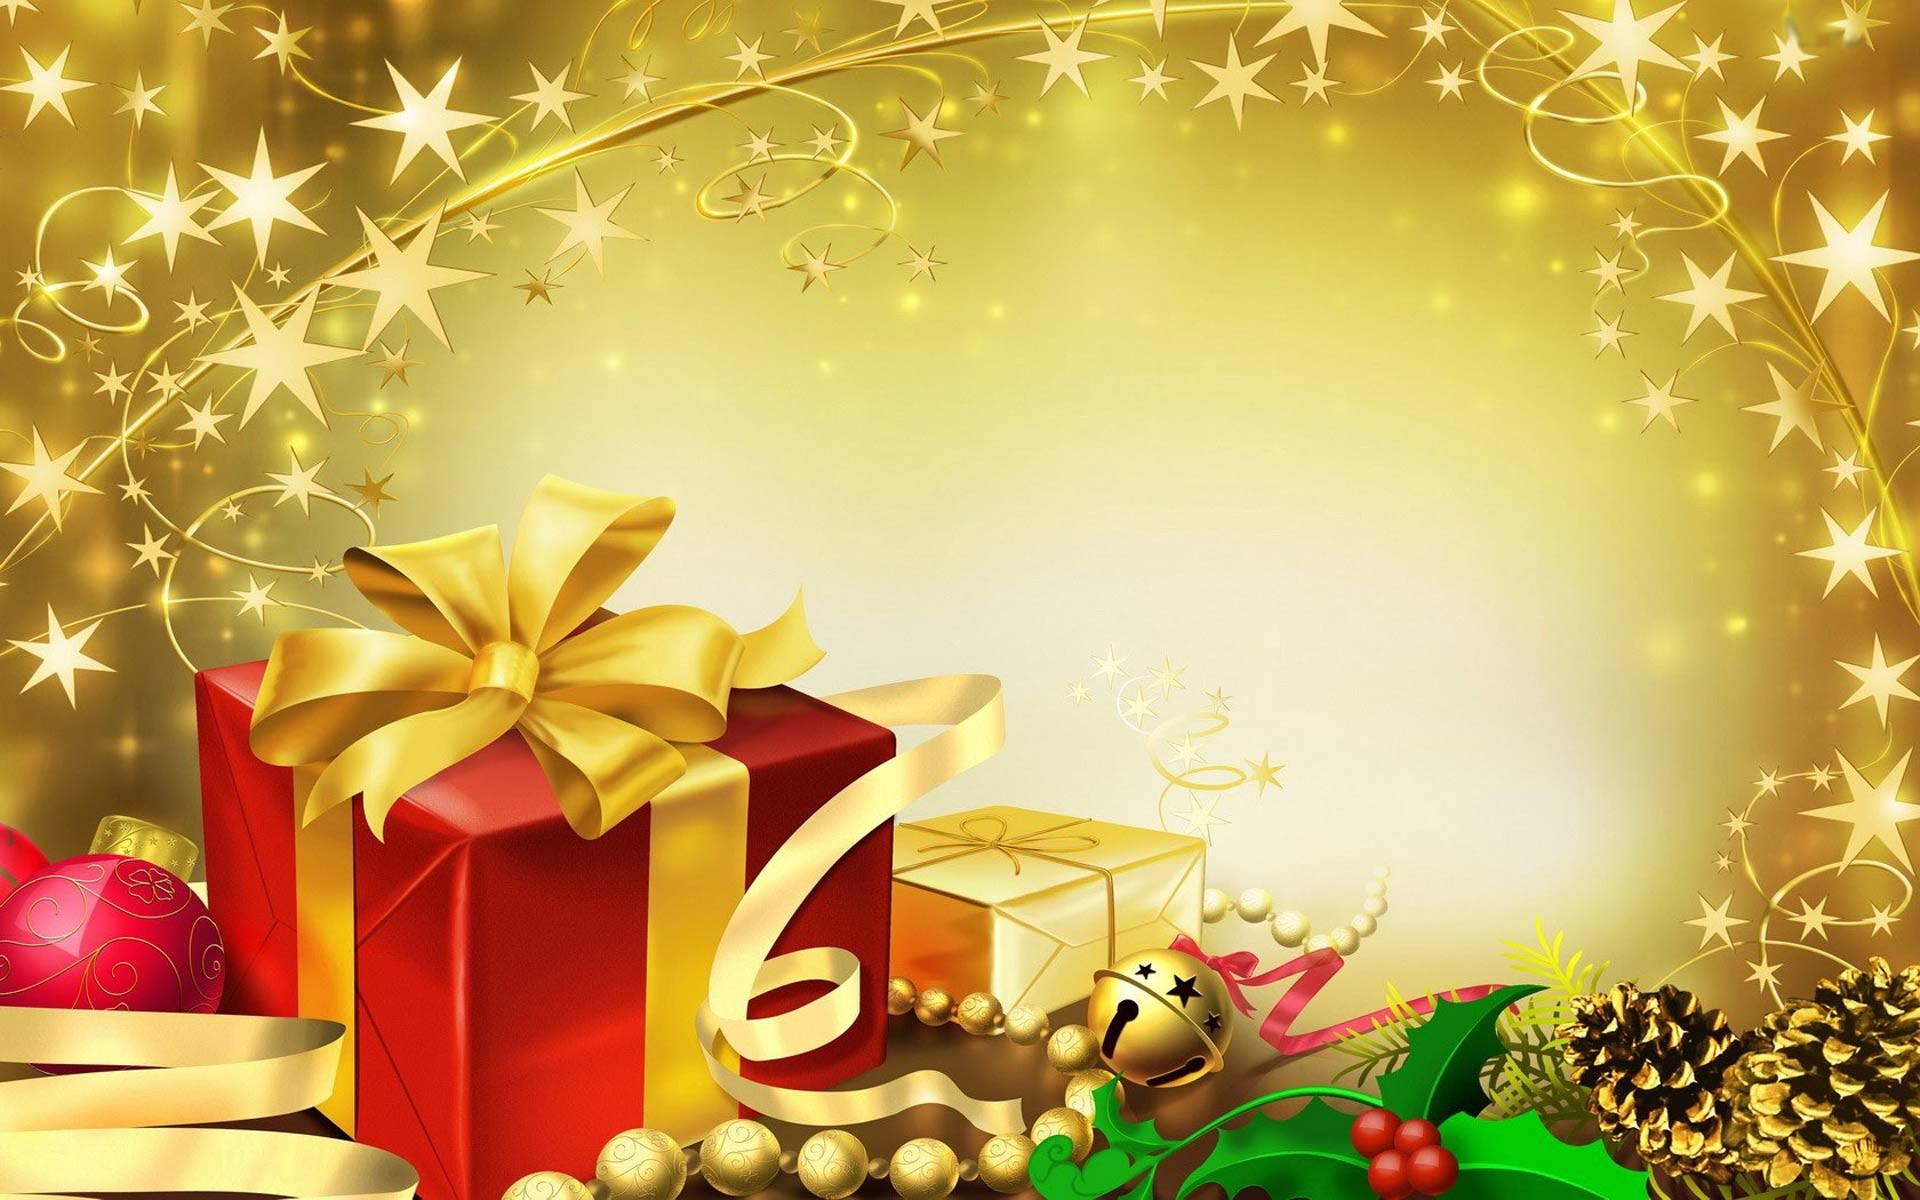 Merry Christmas Widescreen HD wallpapers